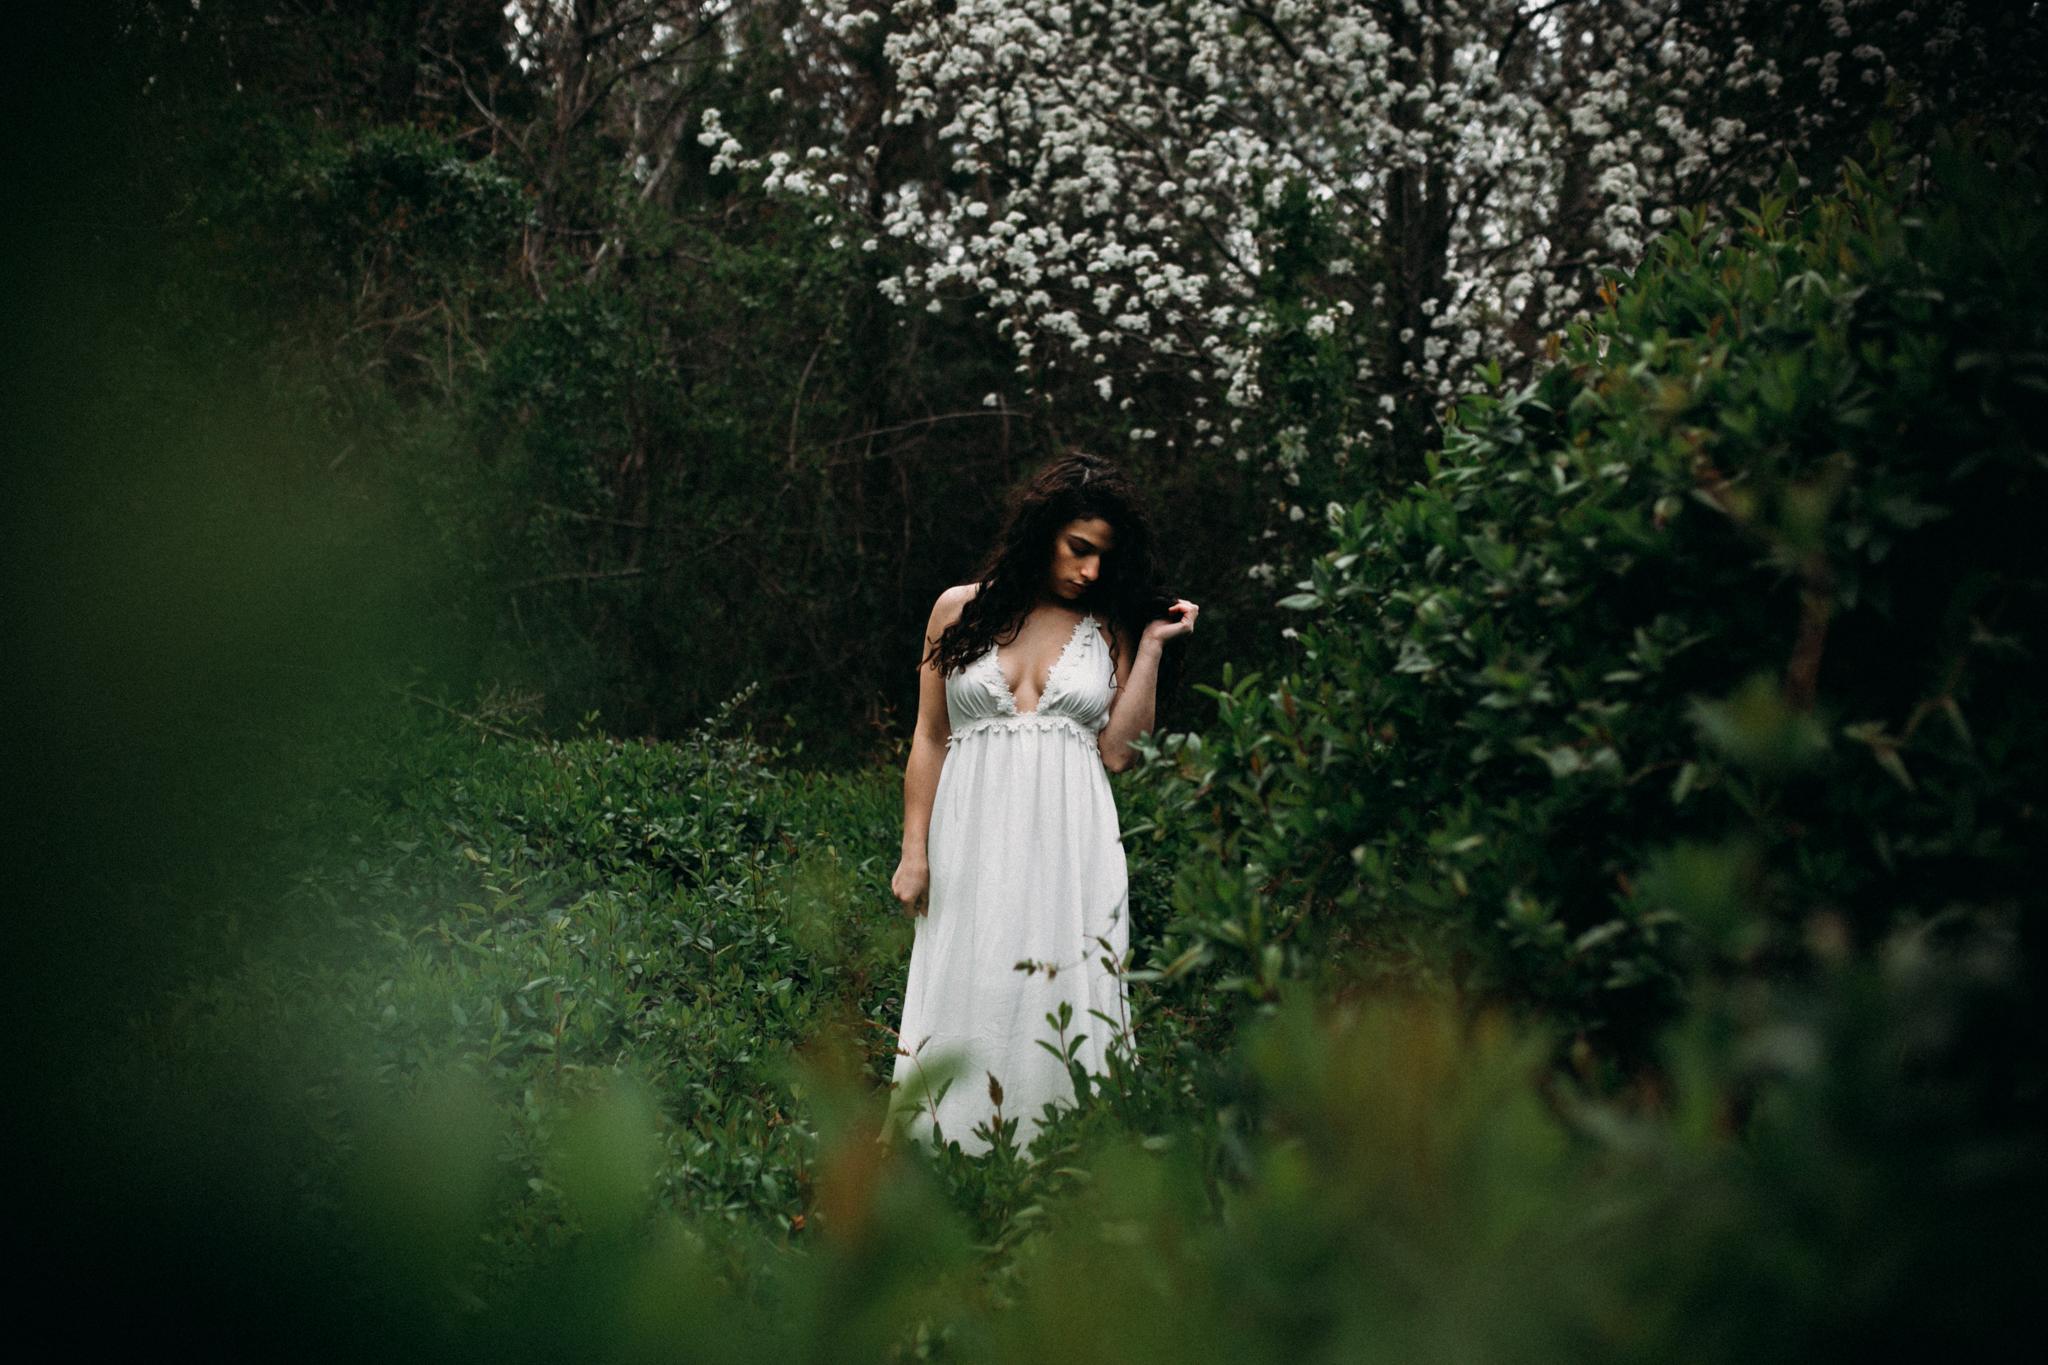 Jessica.VirginiaBeach.Virginia.Boudoir.emotivestorytelling-8.JPG